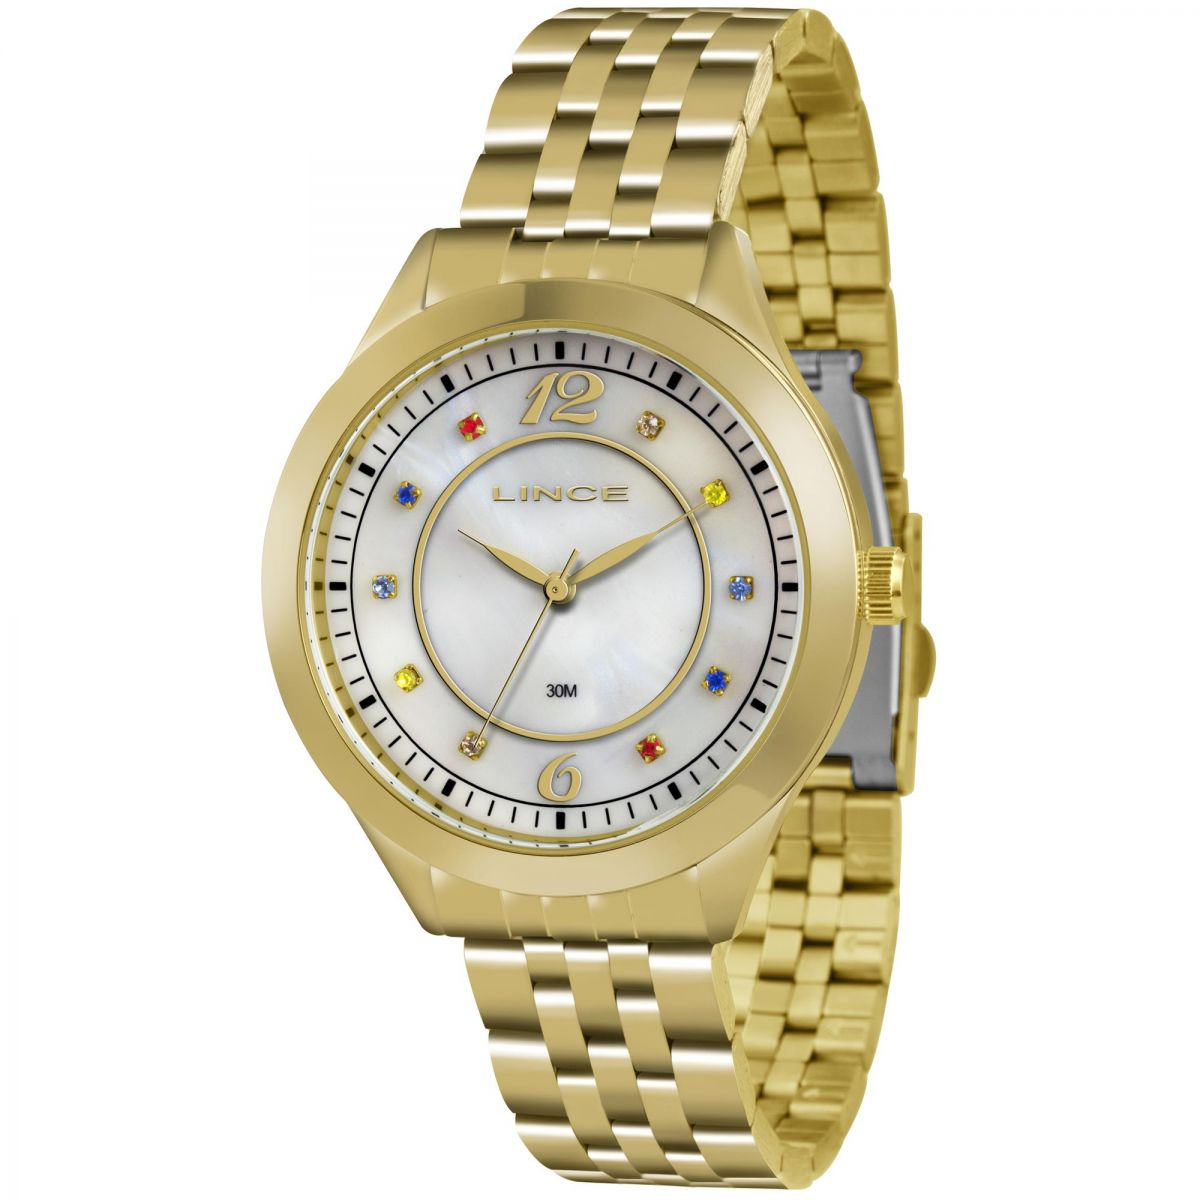 9ebb3a54ba6 Relógio Lince Feminino Ref  Lrg4324l B2kx